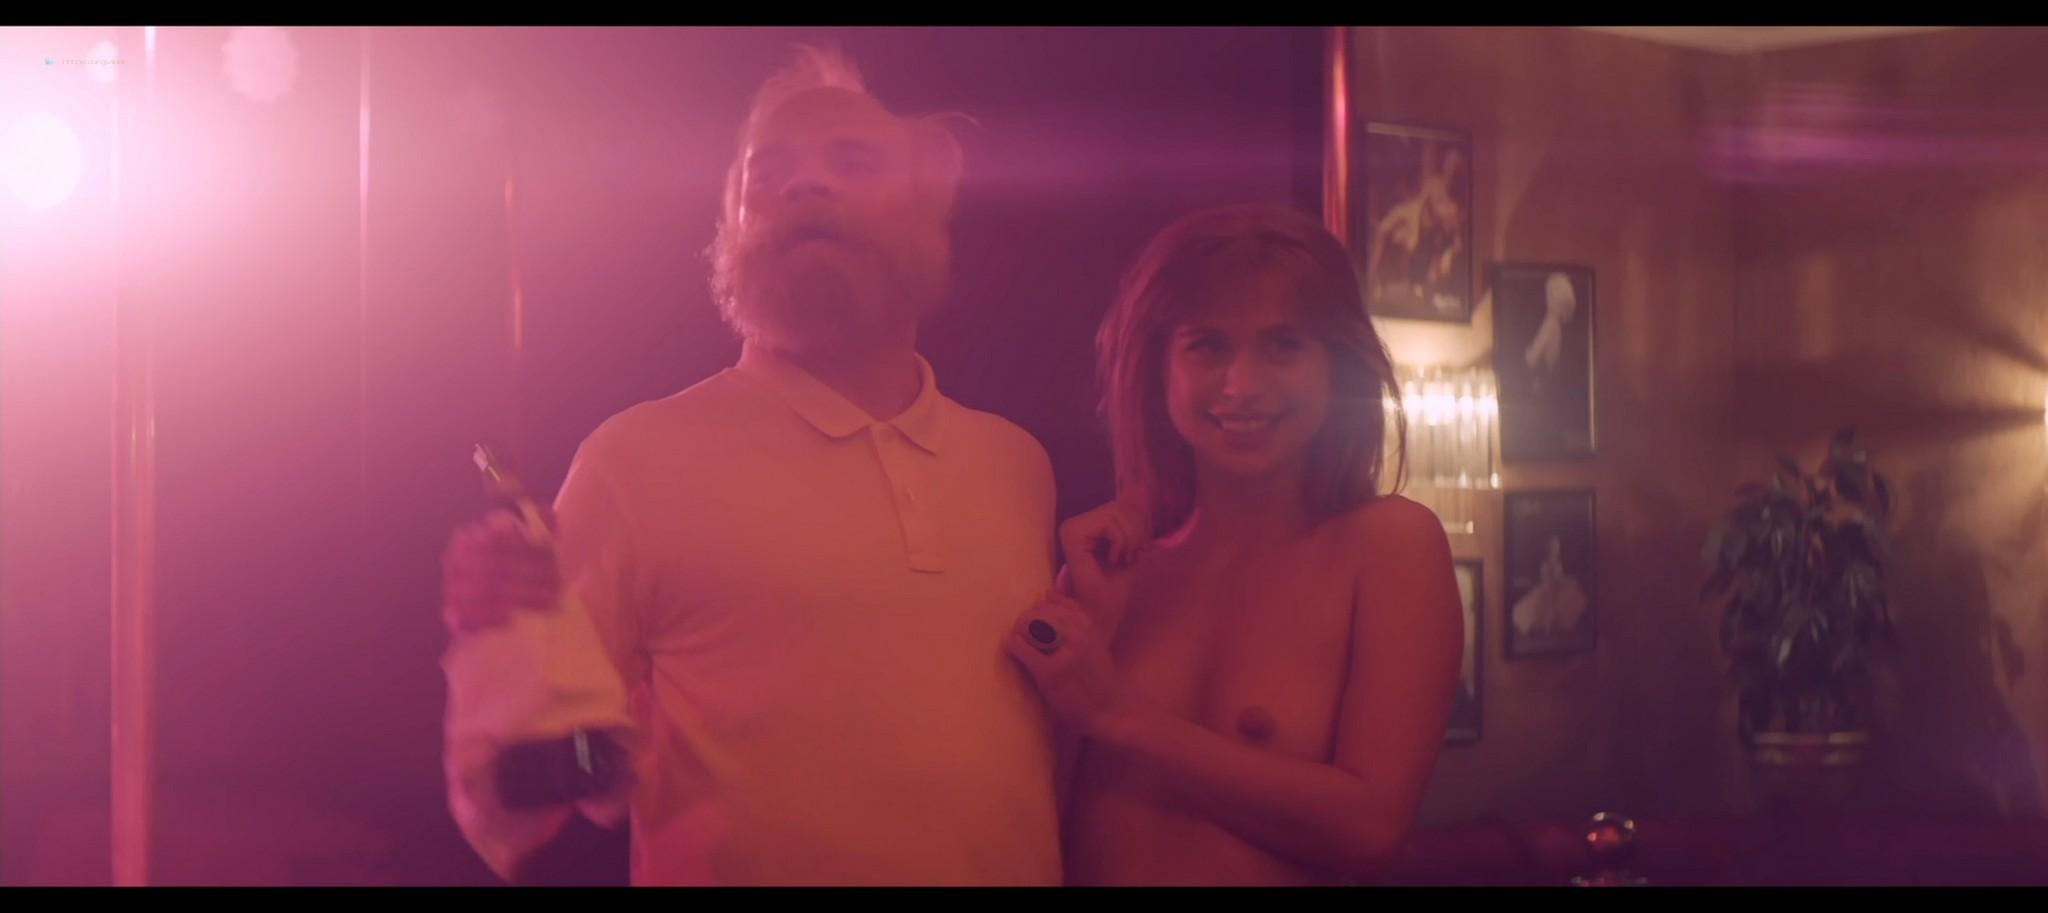 Camilla Cornelia Lehmann nude Sarahsita Lassen, nude and explicit body parts - Spies Og Glistrup (DK-2013) HD 1080p BluRay (11)